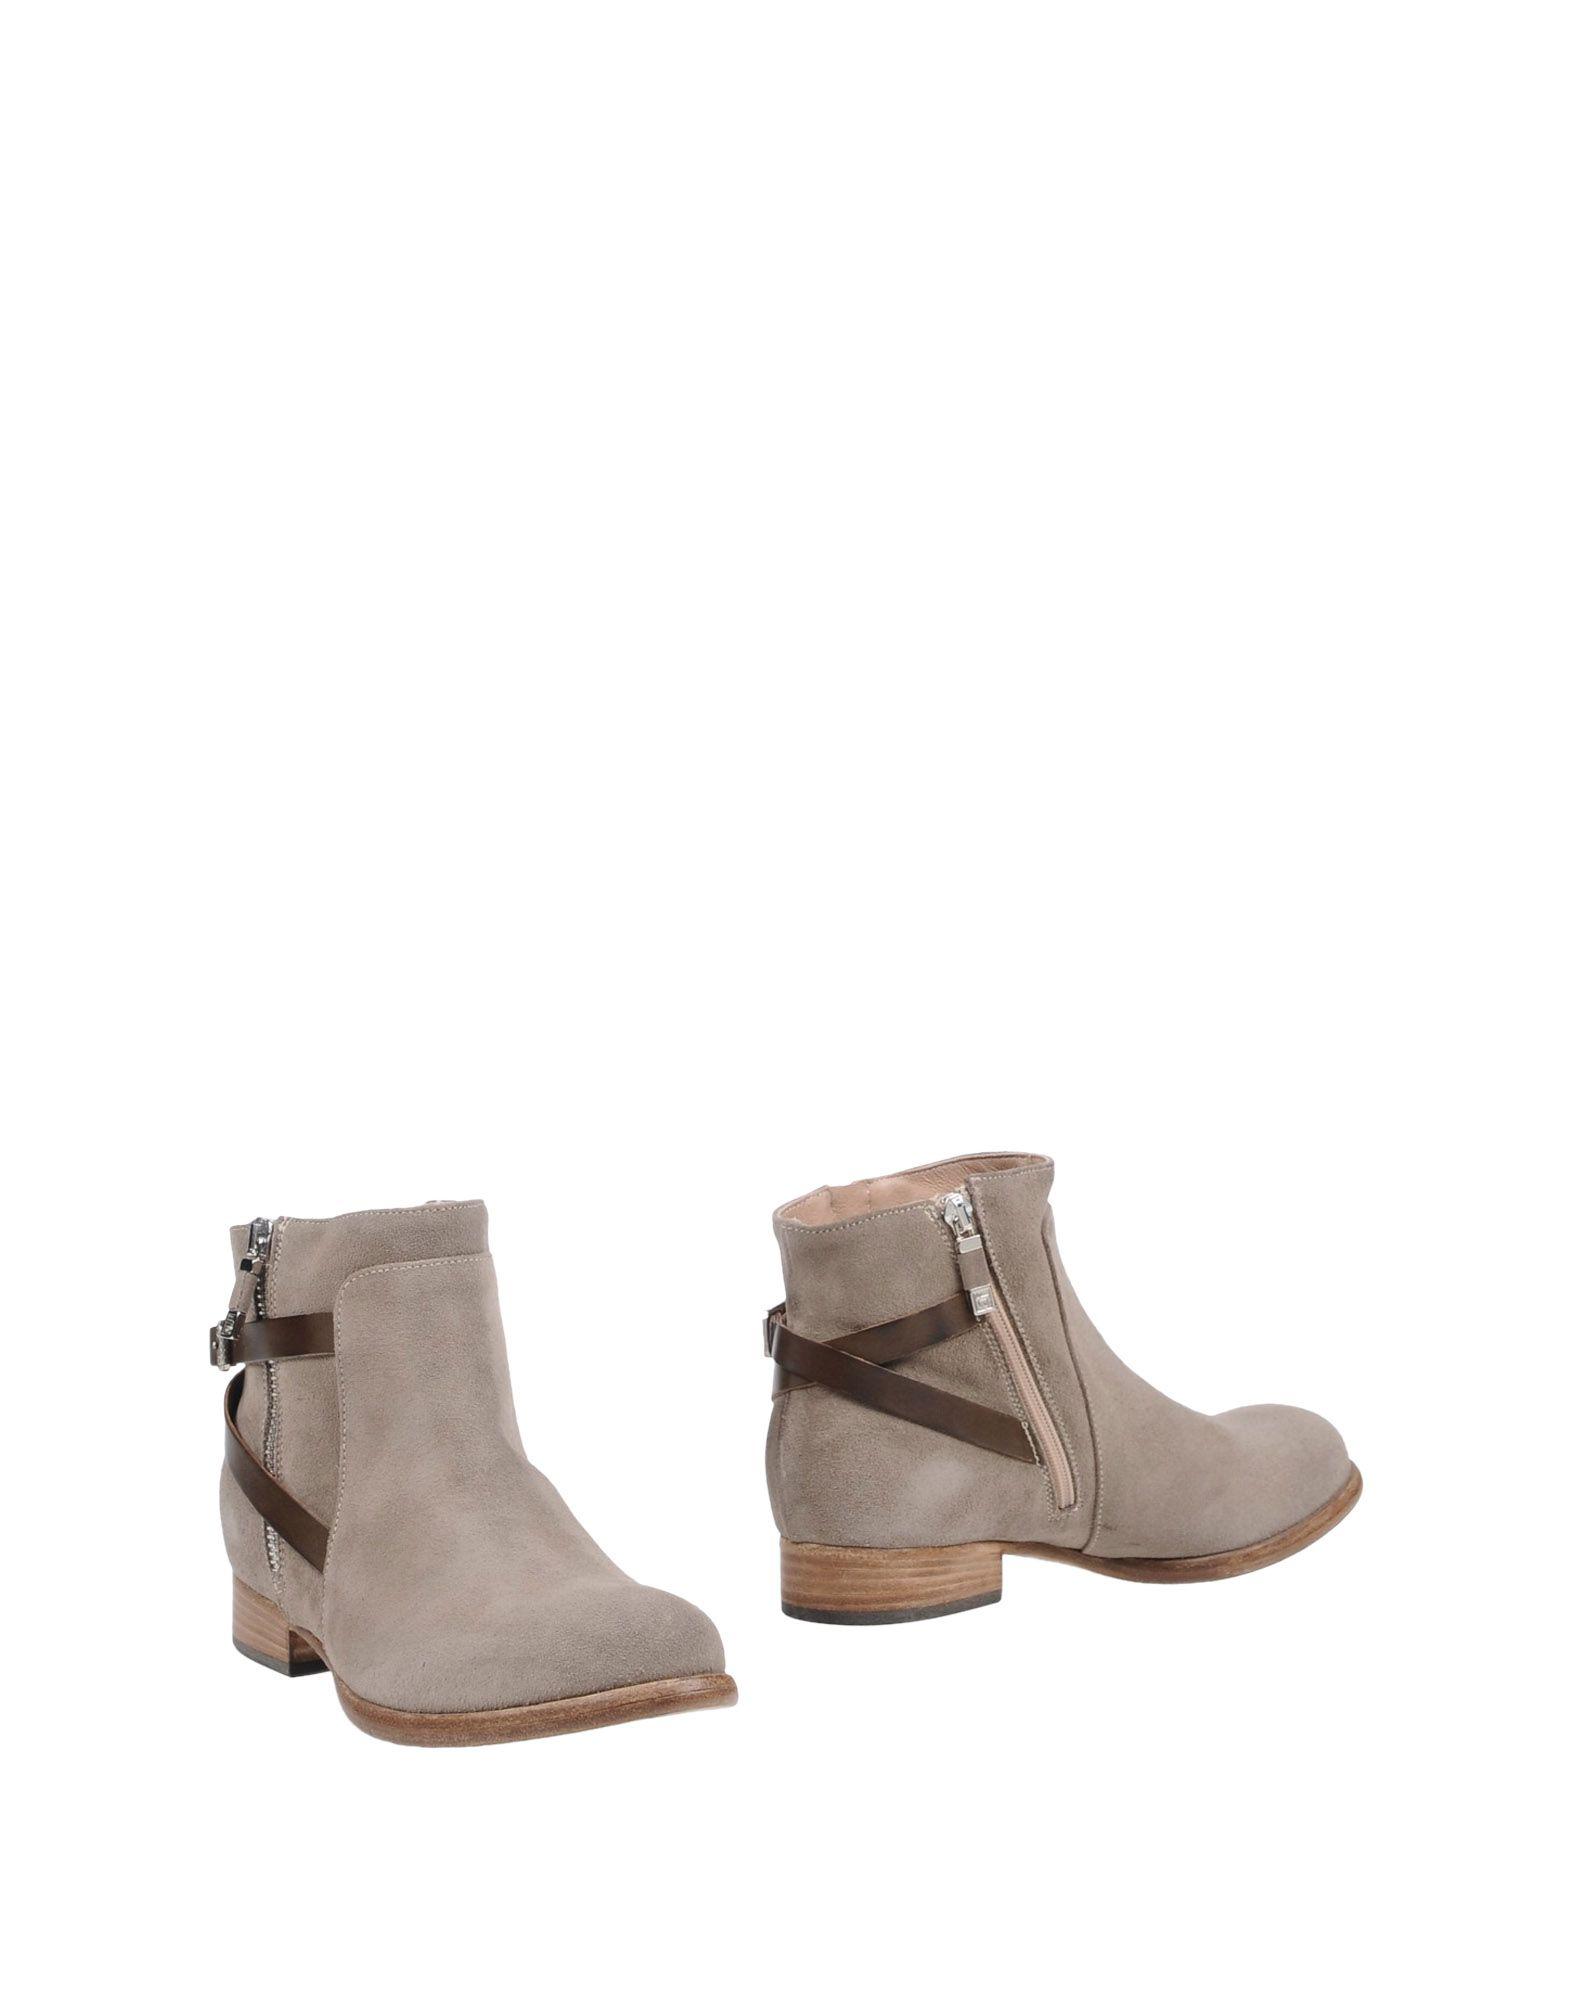 Stilvolle Fermani billige Schuhe Alberto Fermani Stilvolle Stiefelette Damen  11088369CR aba498